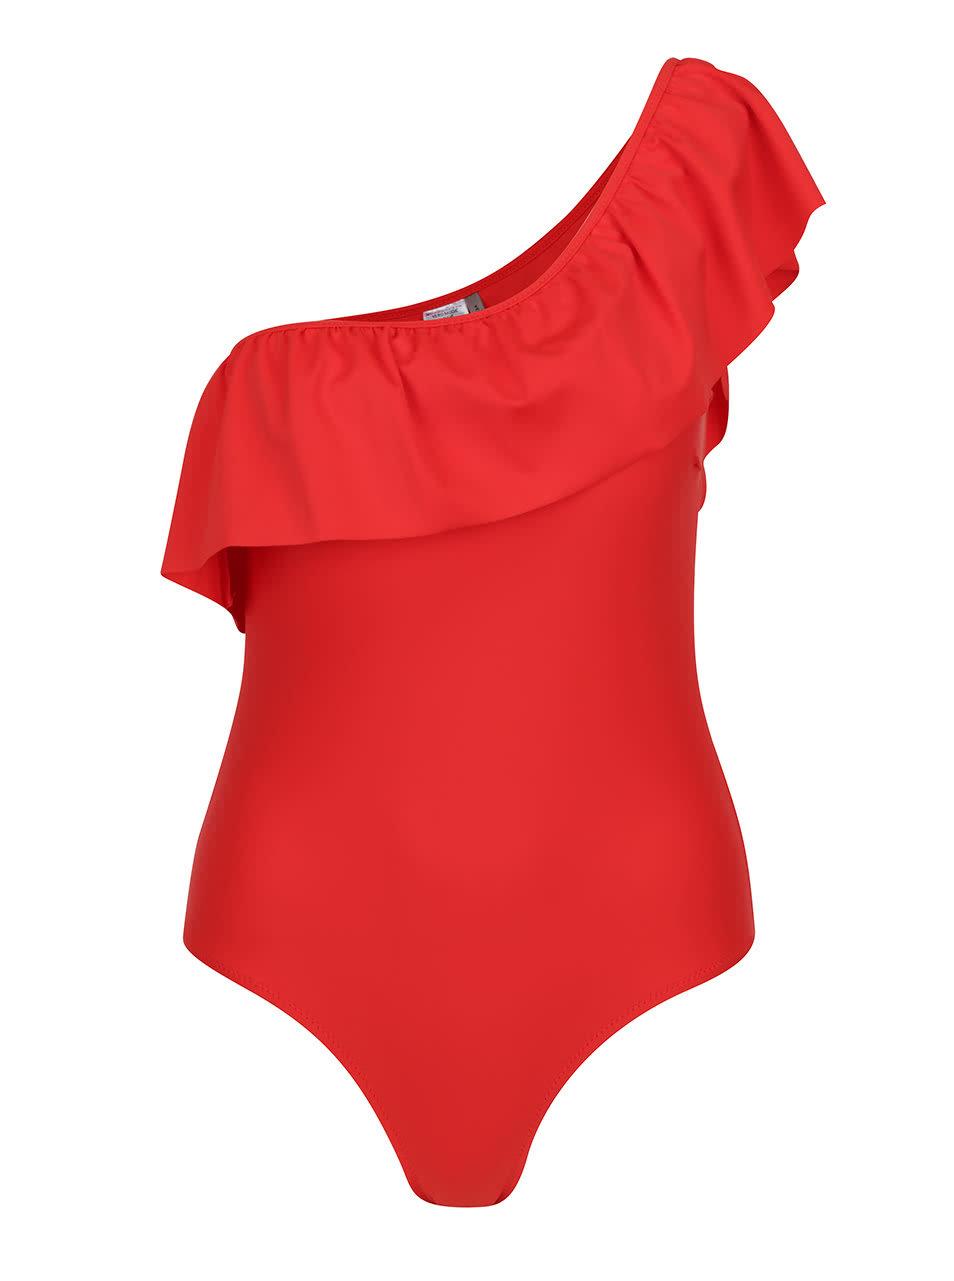 Červené jednodílné plavky přes jedno rameno s volány VERO MODA Ella ... ee5c7b4be6